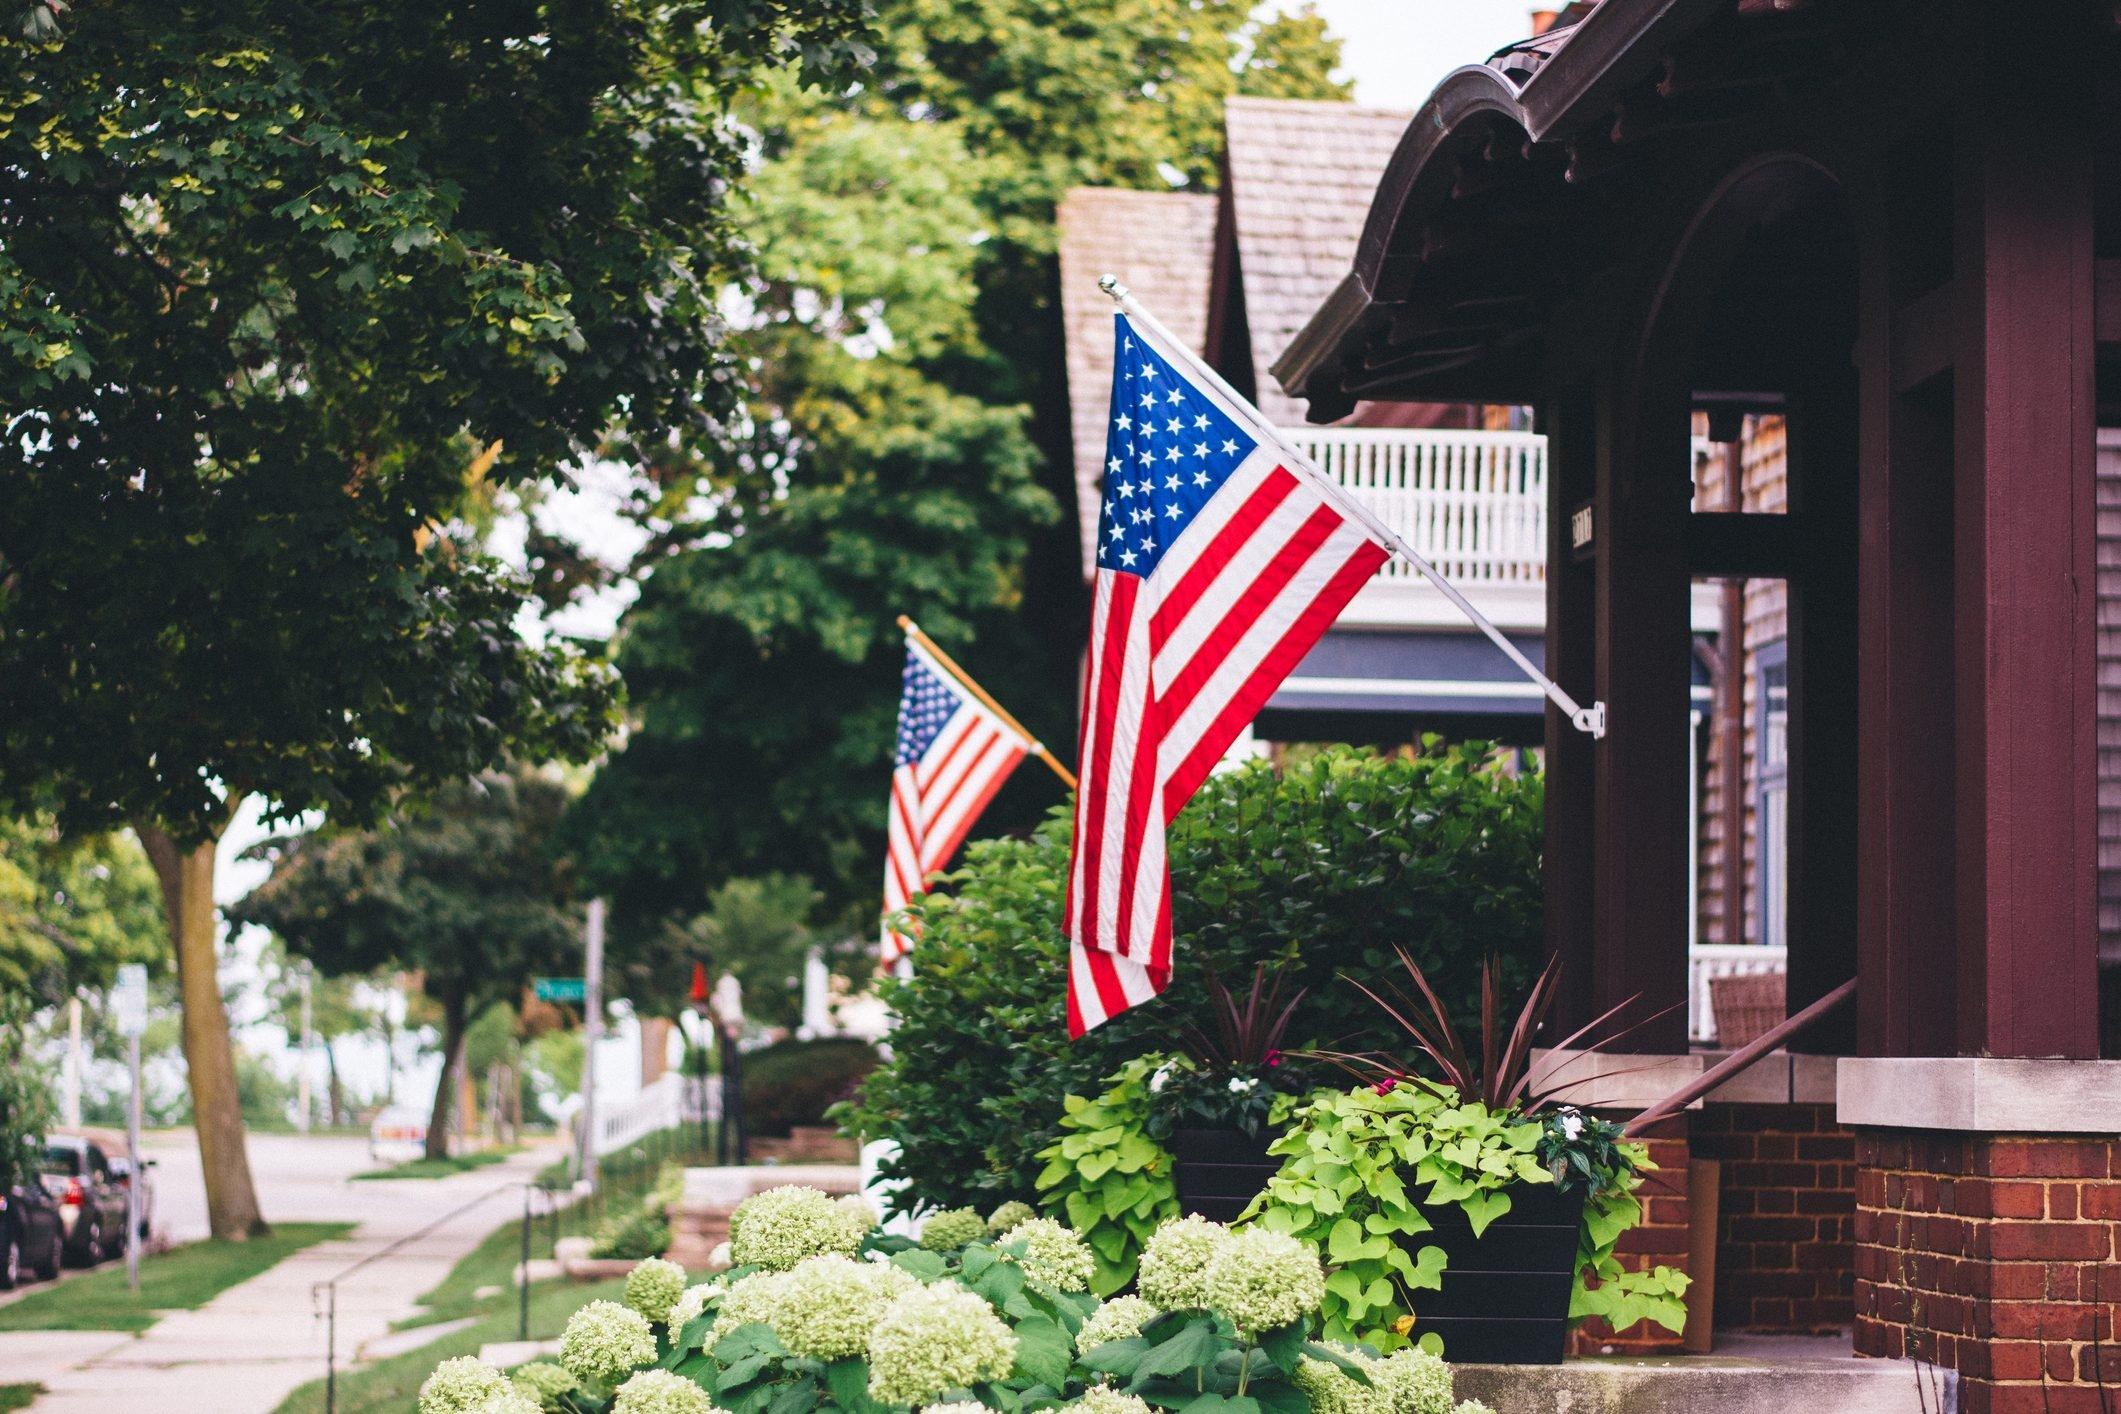 American Flags On consecutive houses along a quaint neighborhood street